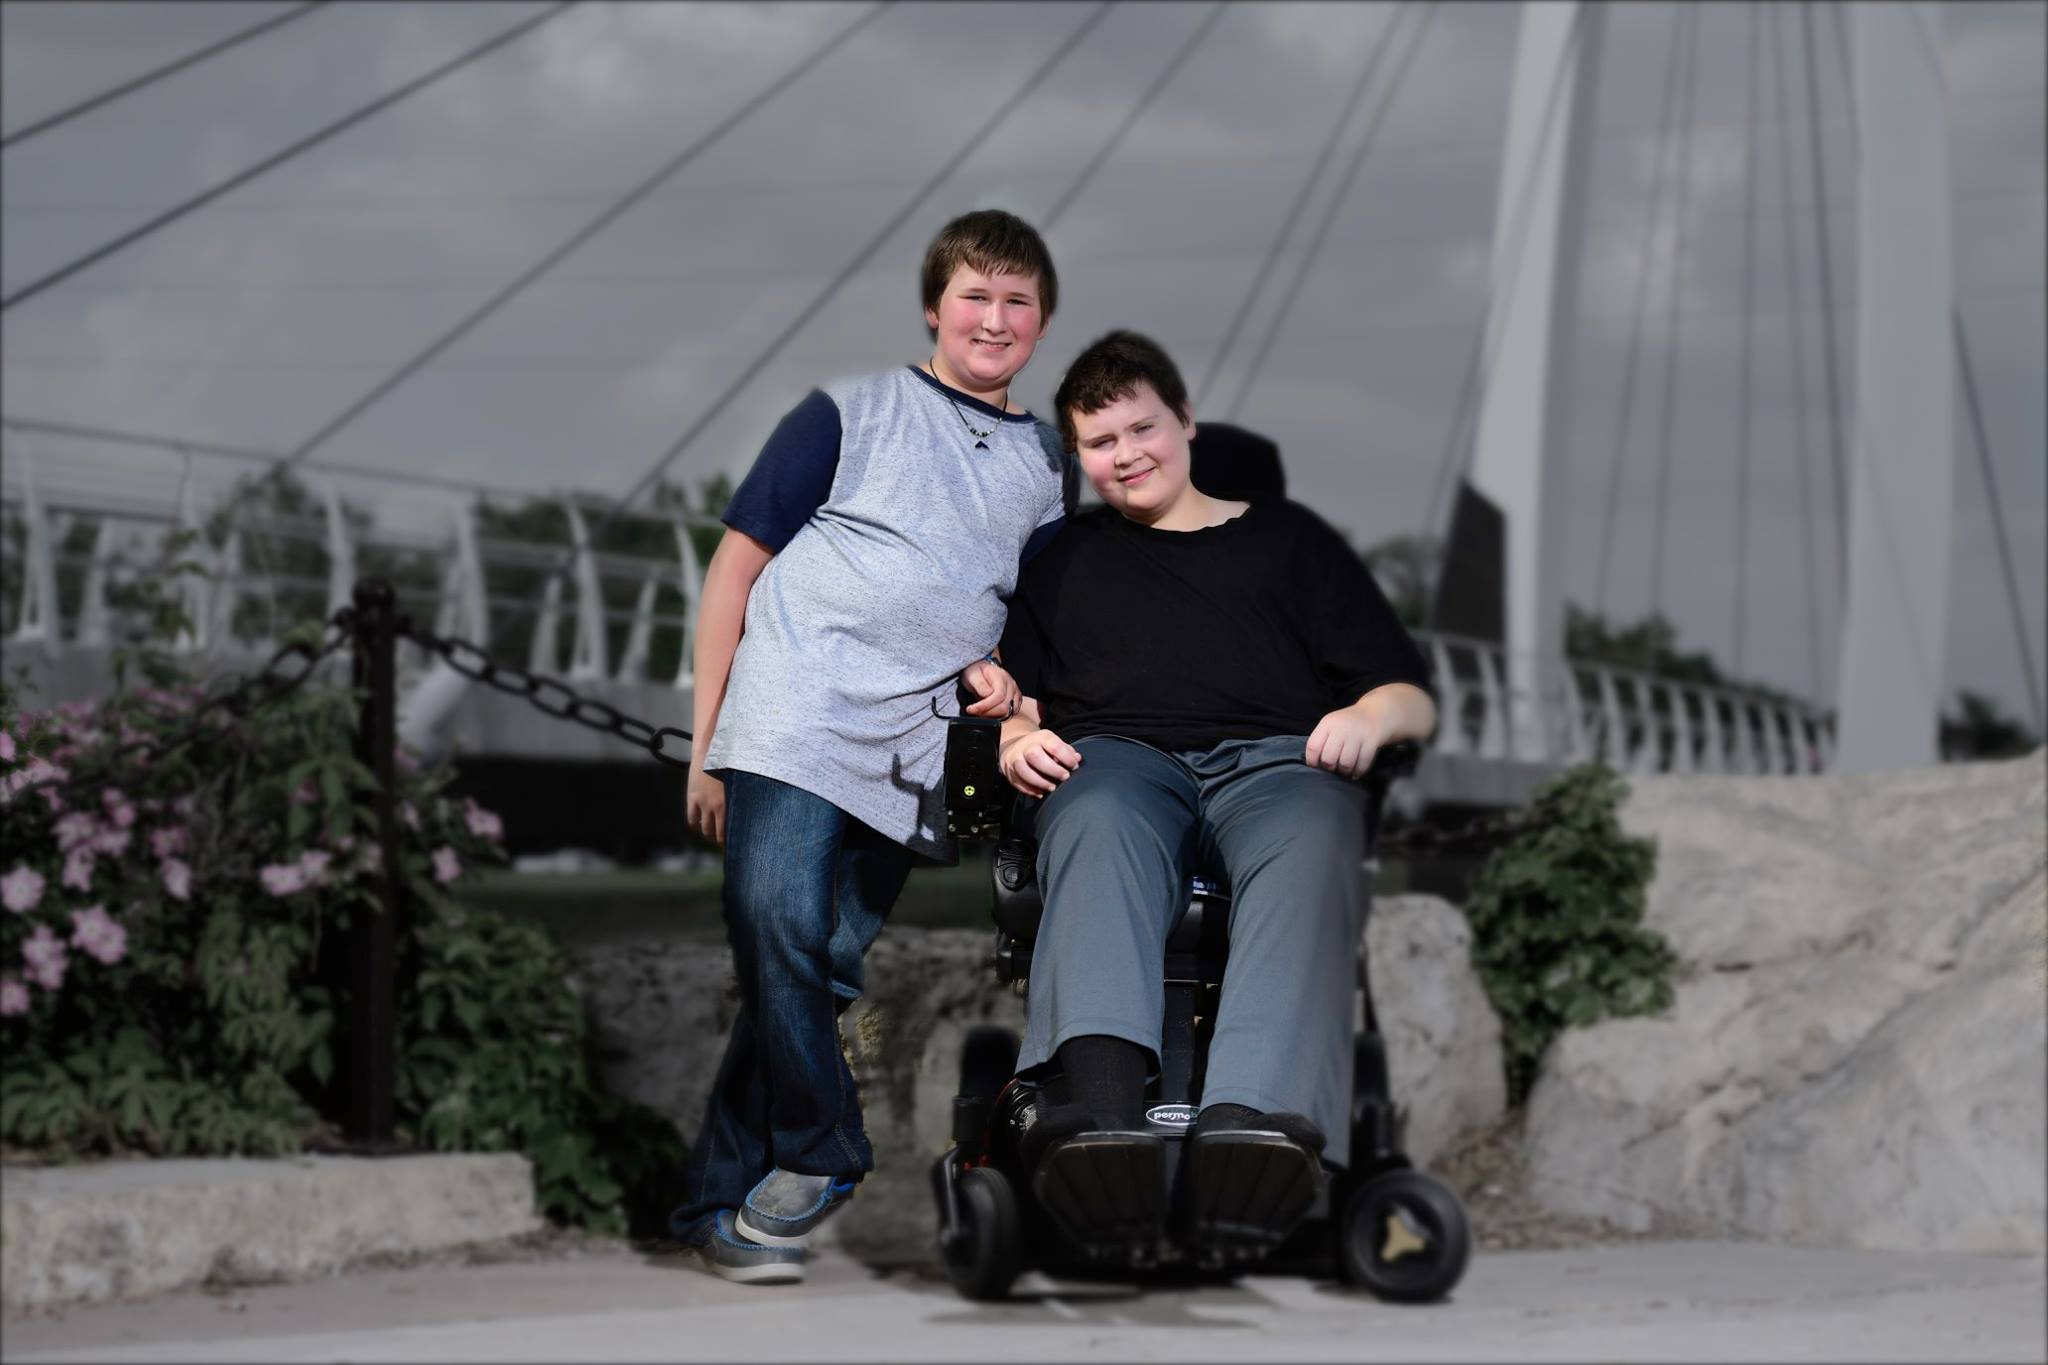 Wichita mom raising money for sons in need, Wichita's Littlest H